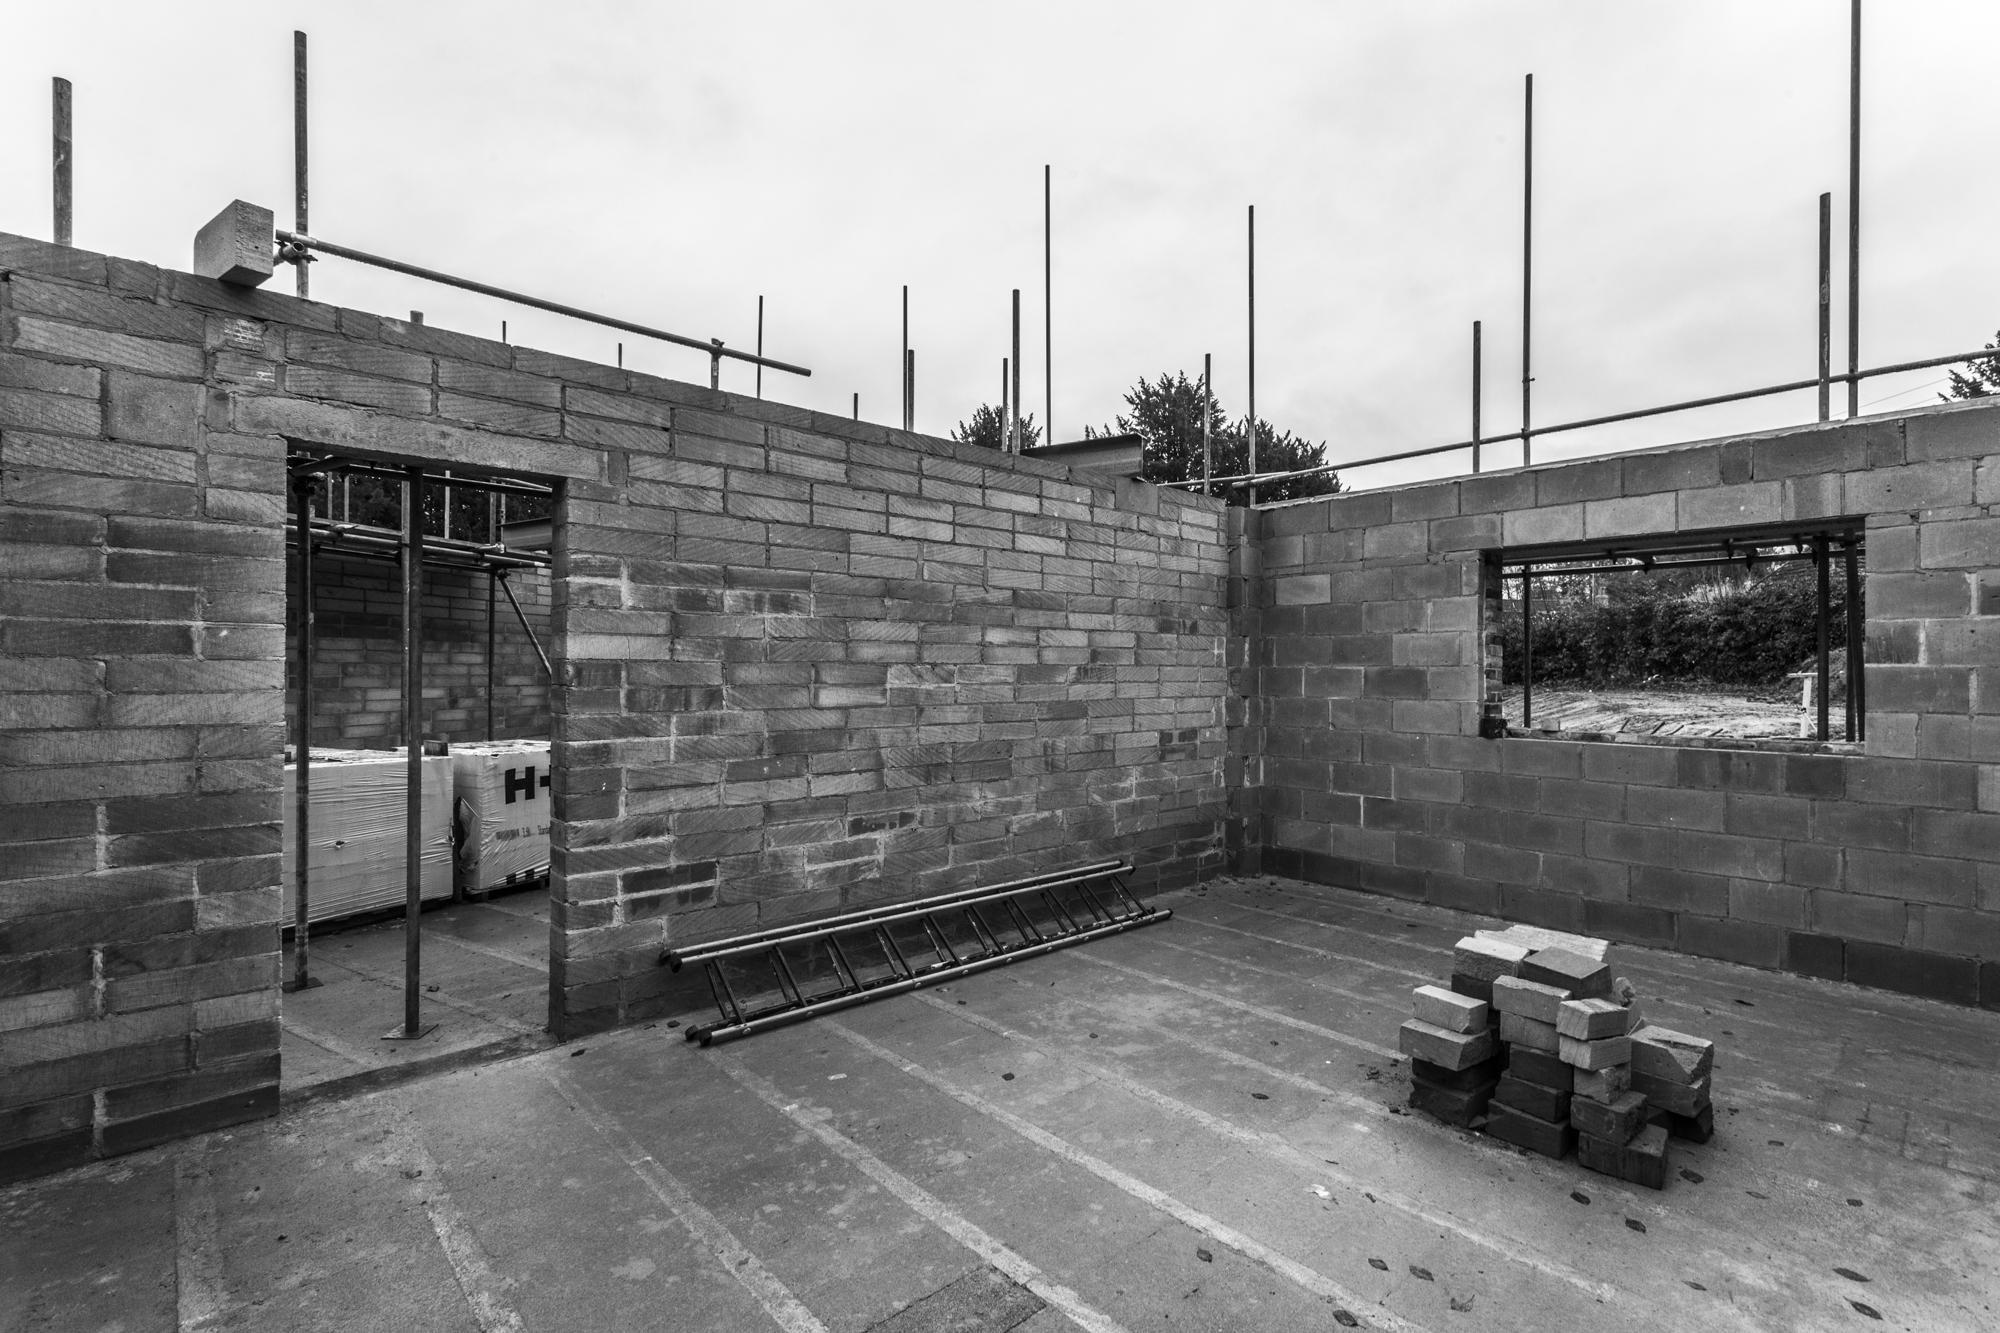 FlinthurstHouse_Construction_14.jpg